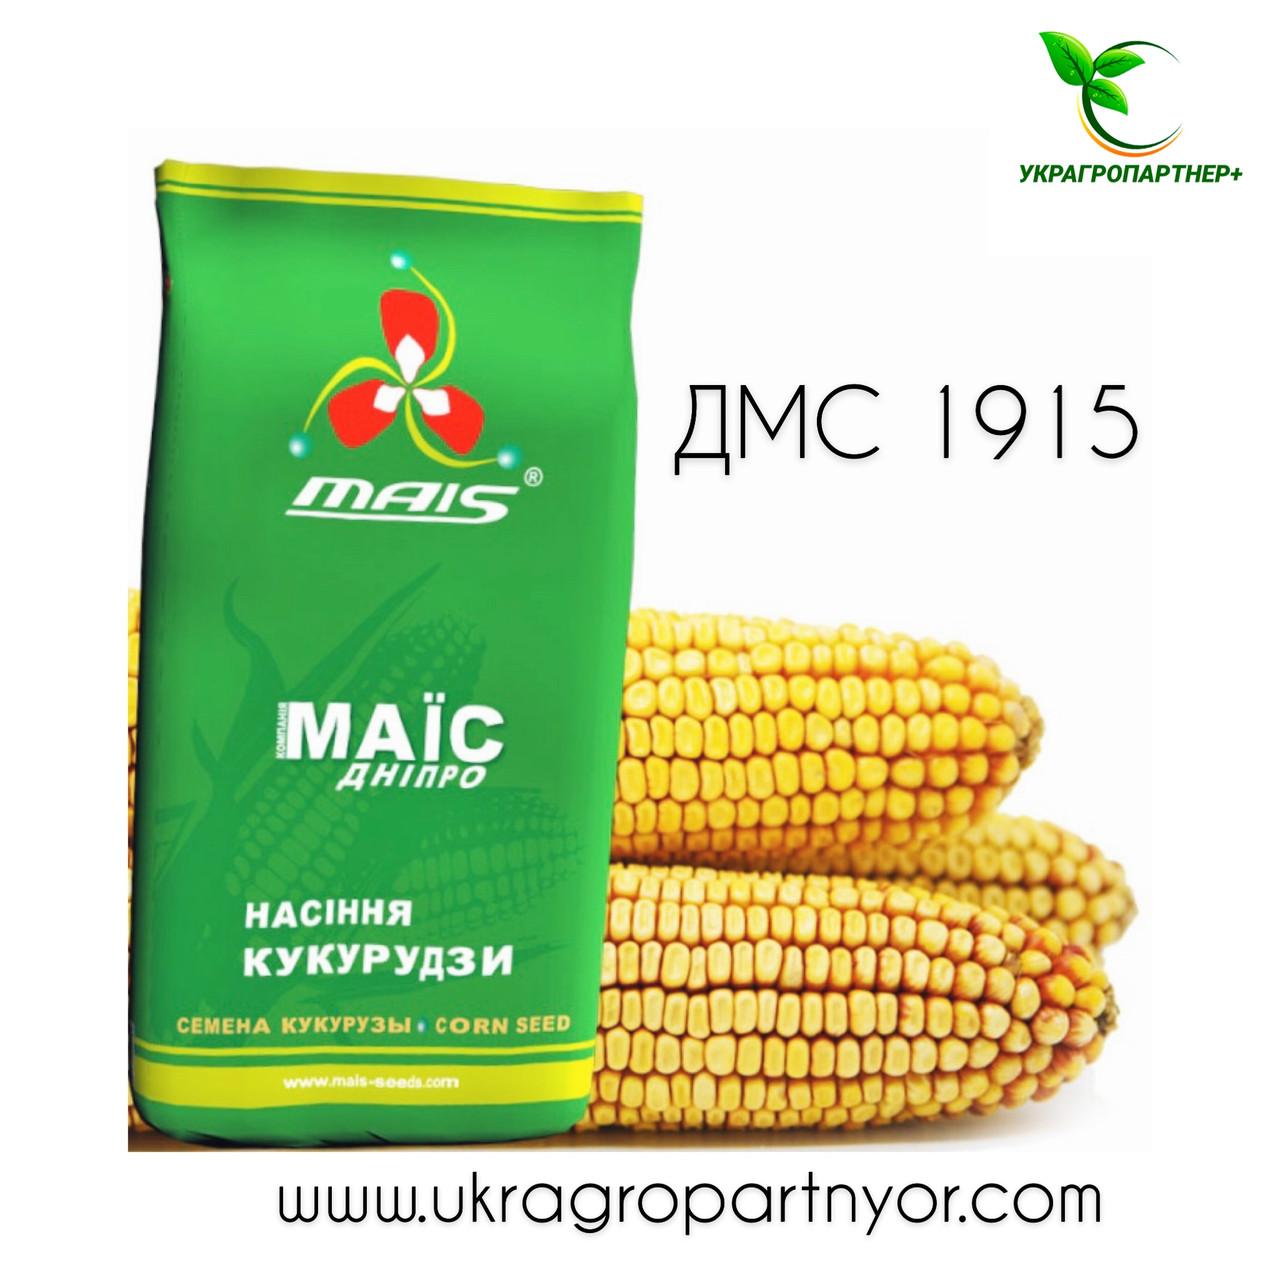 КУКУРУЗА  ДМС 1915 (ФАО - 190)  (МАИС Синельниково)